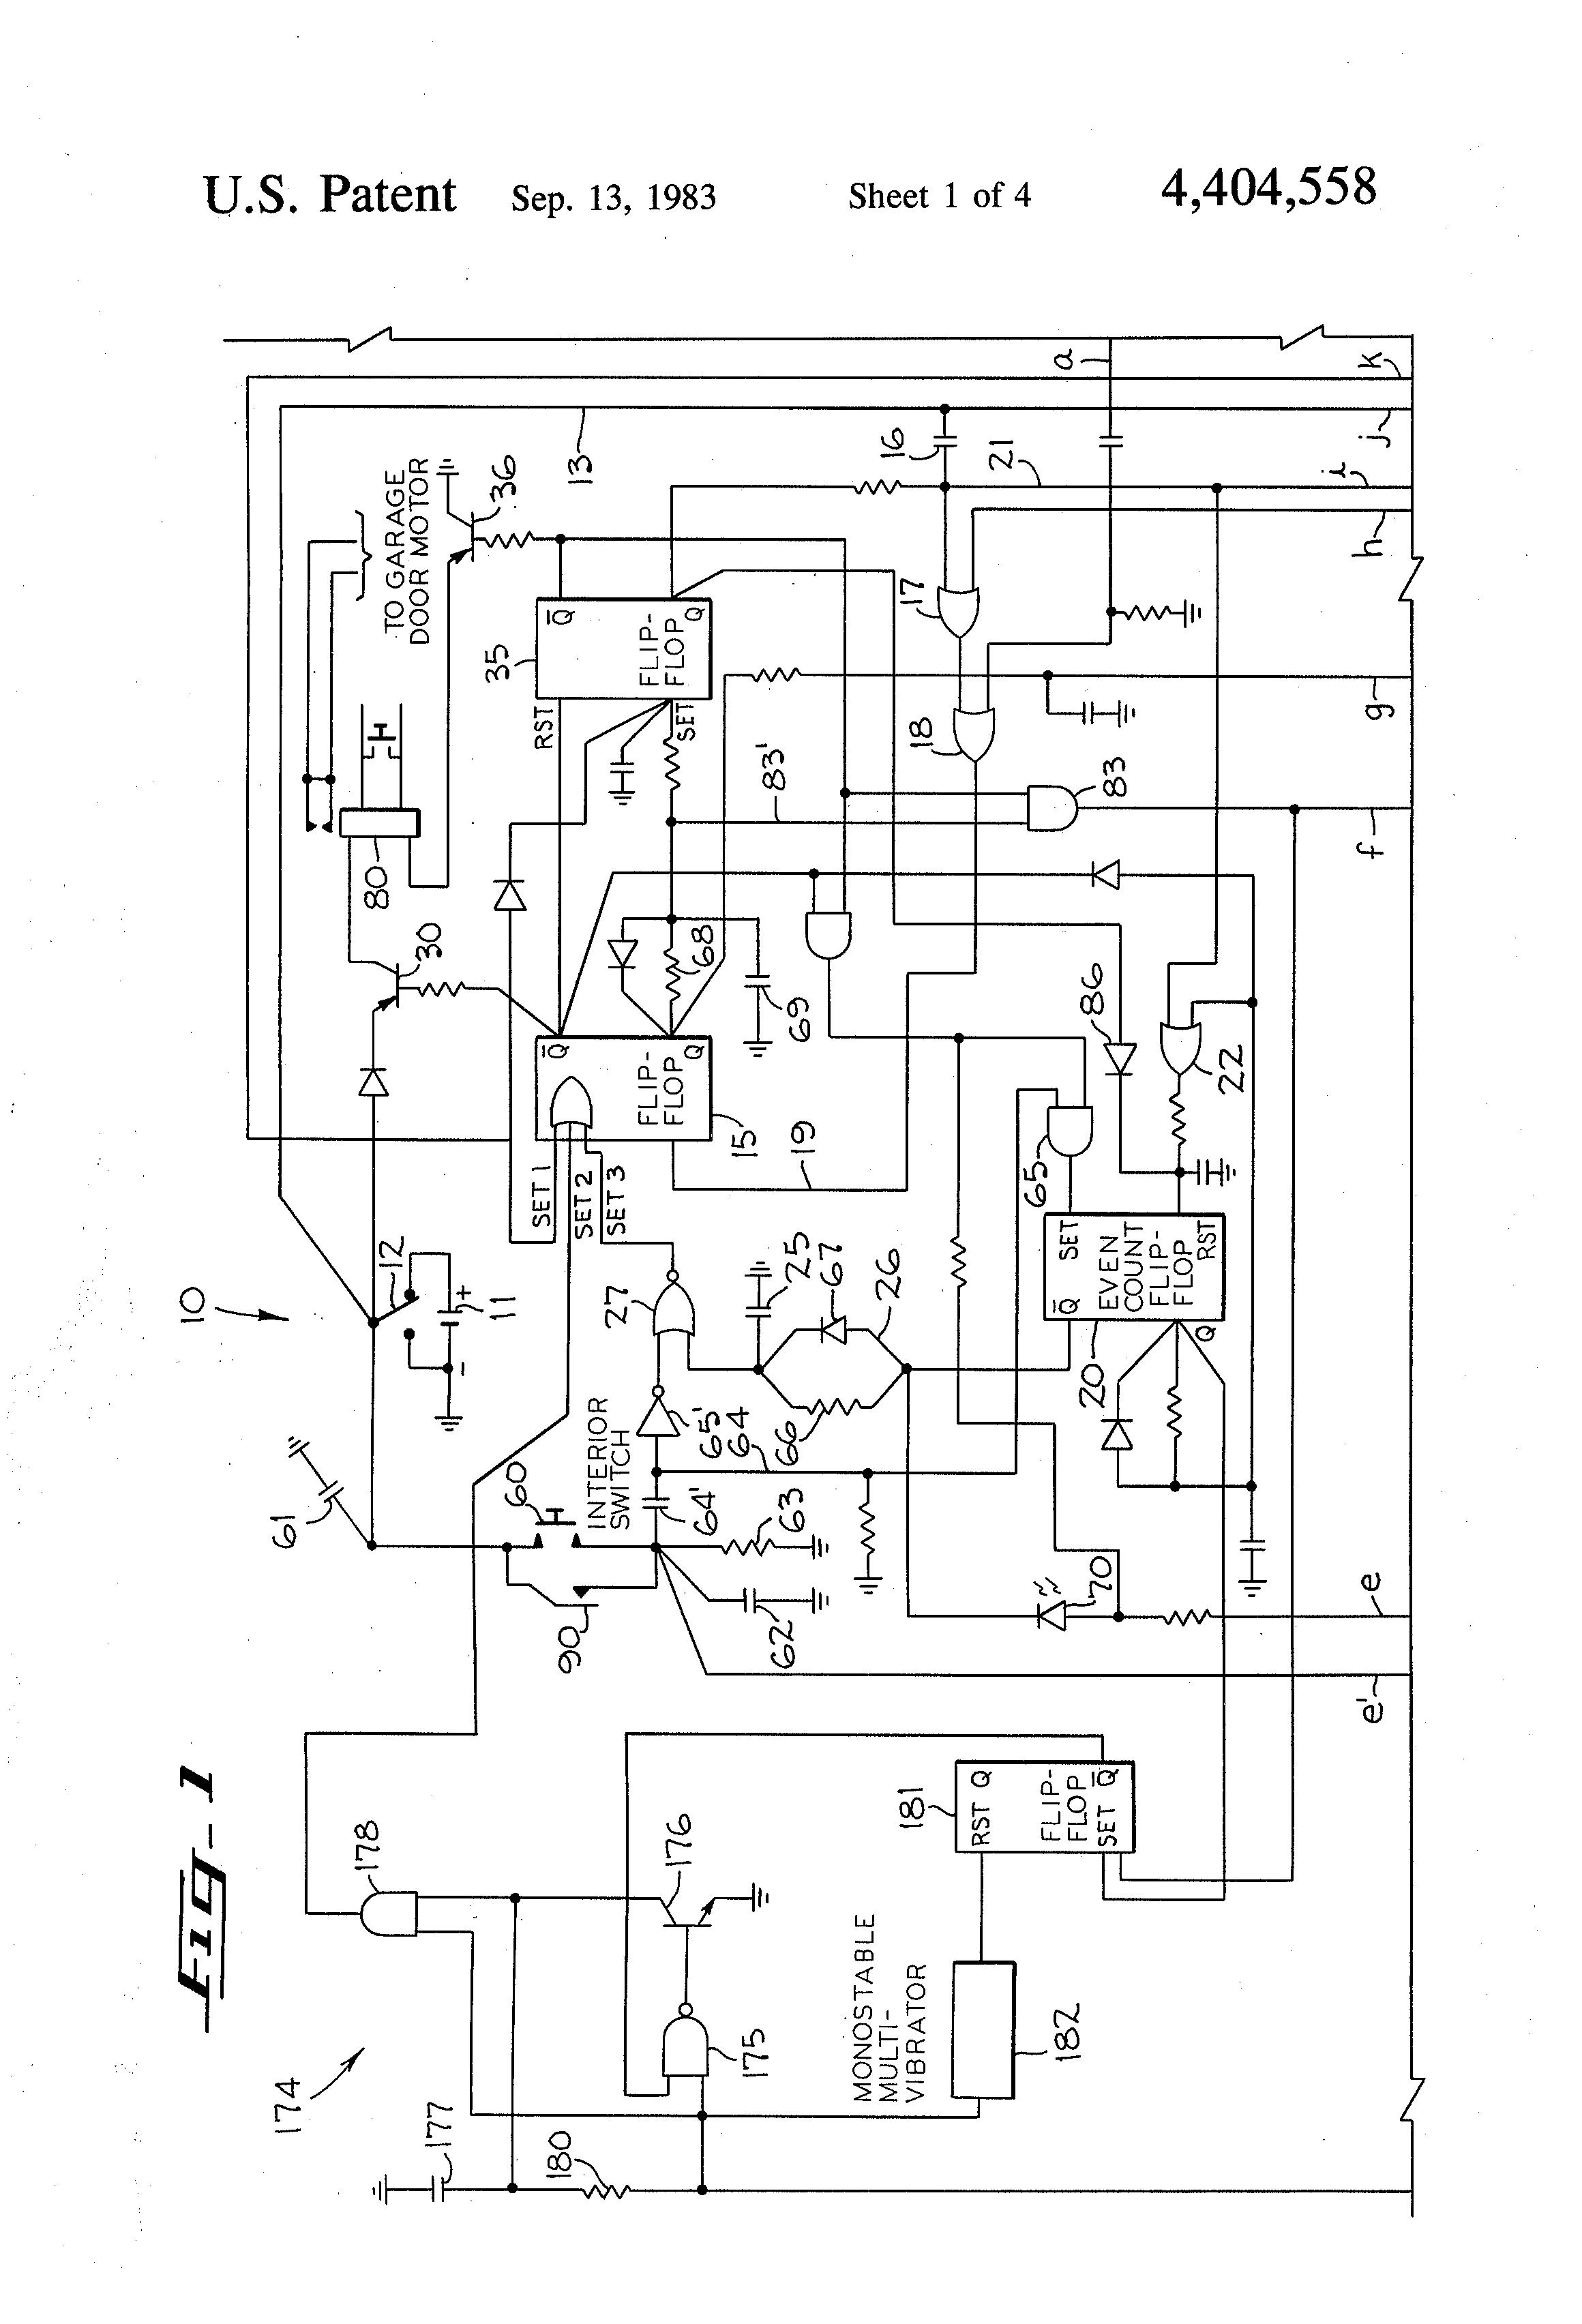 Cool Garage Door Opener Remote Control Circuit Diagram Wiring Diagram Wiring Cloud Oideiuggs Outletorg